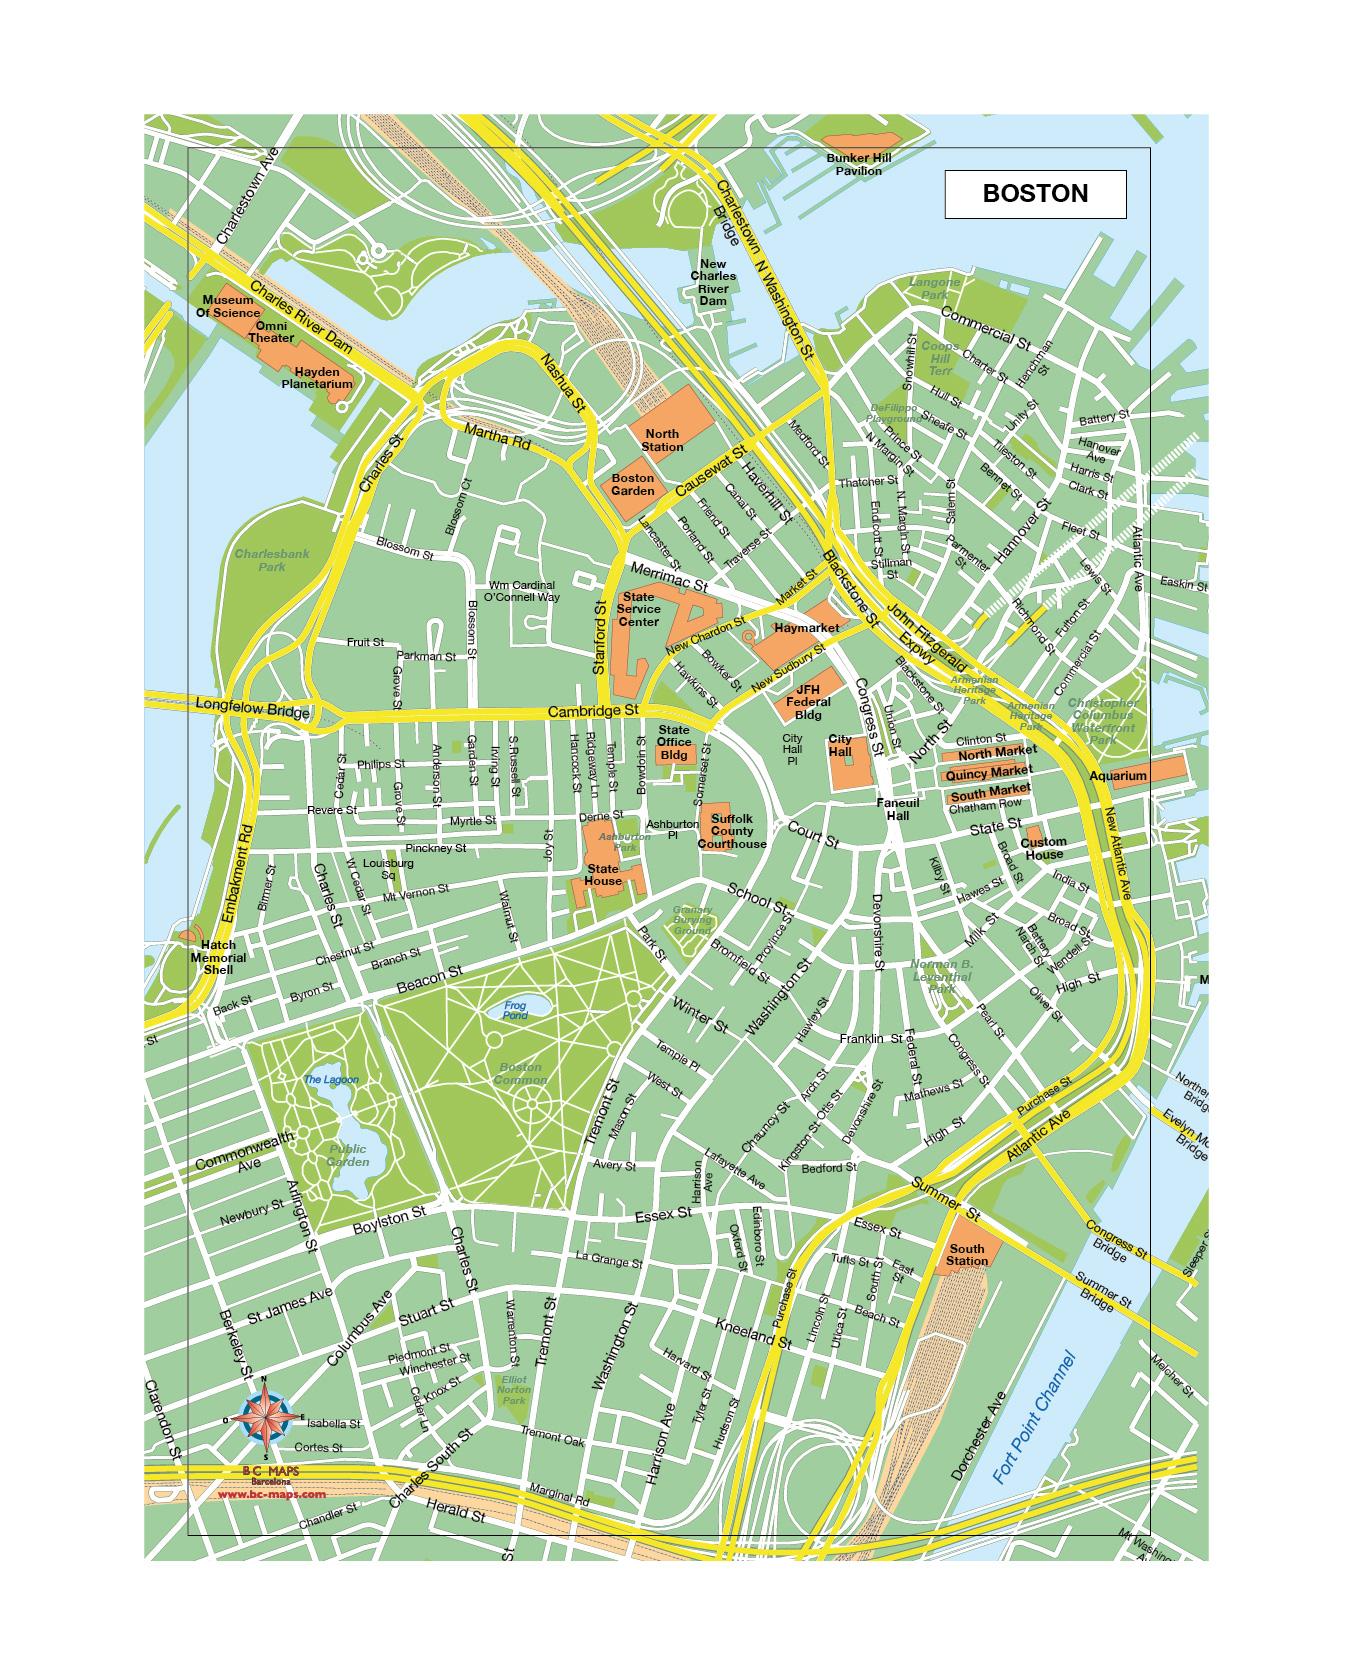 Boston mapa vectorial illustrator eps